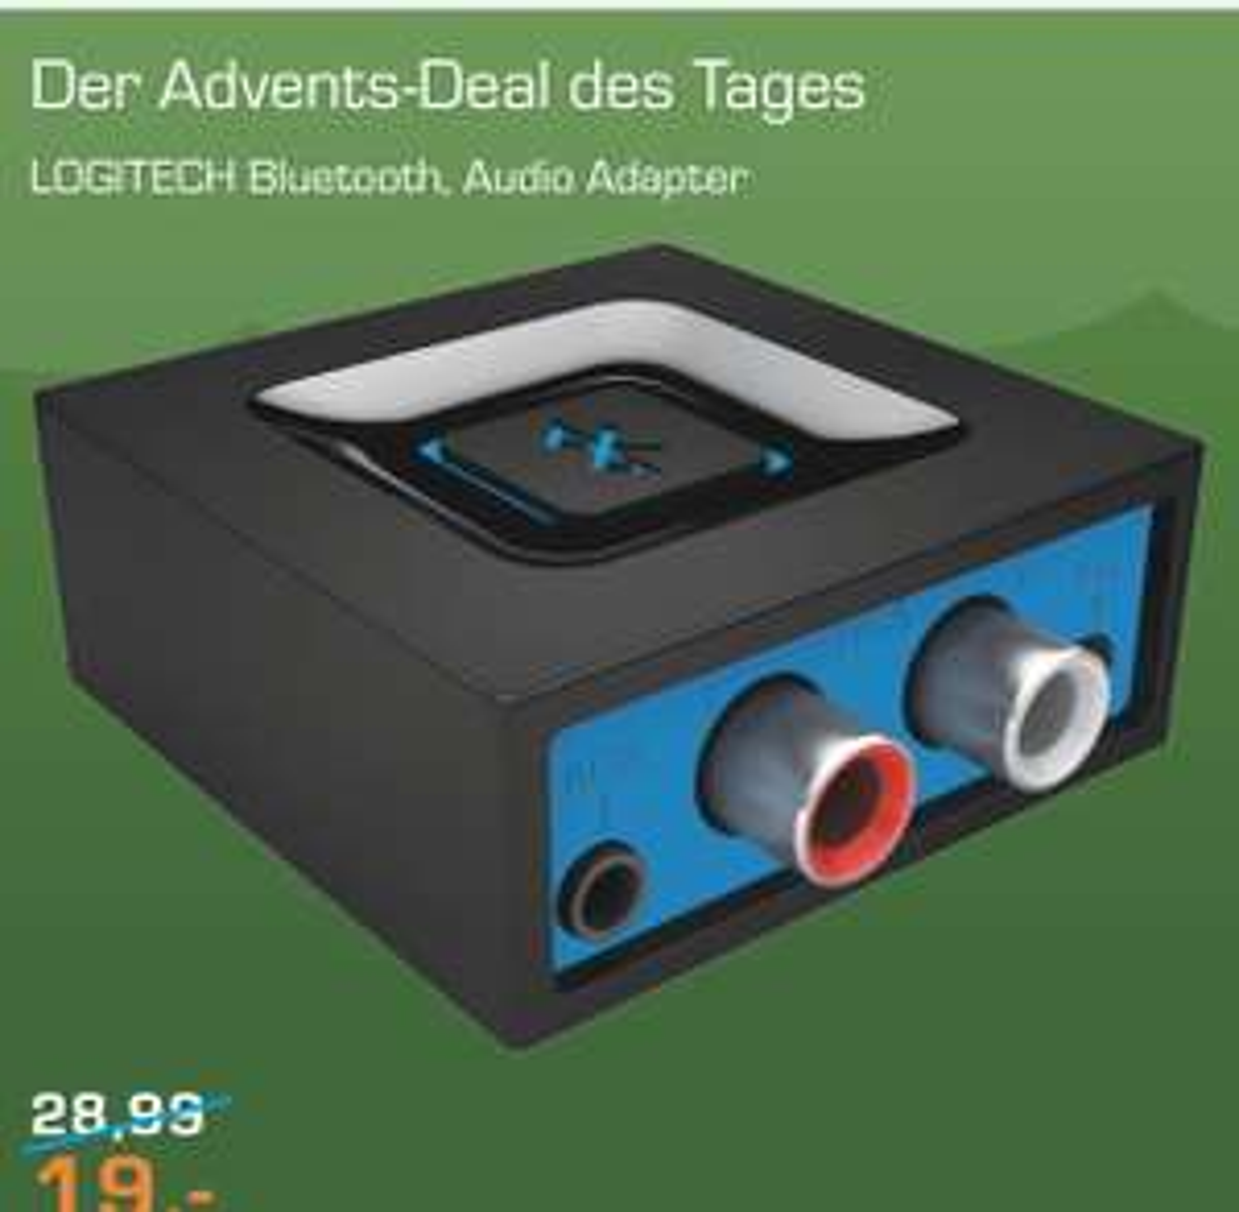 Logitech Bluetooth Adapter, versandkostenfrei bei Saturn